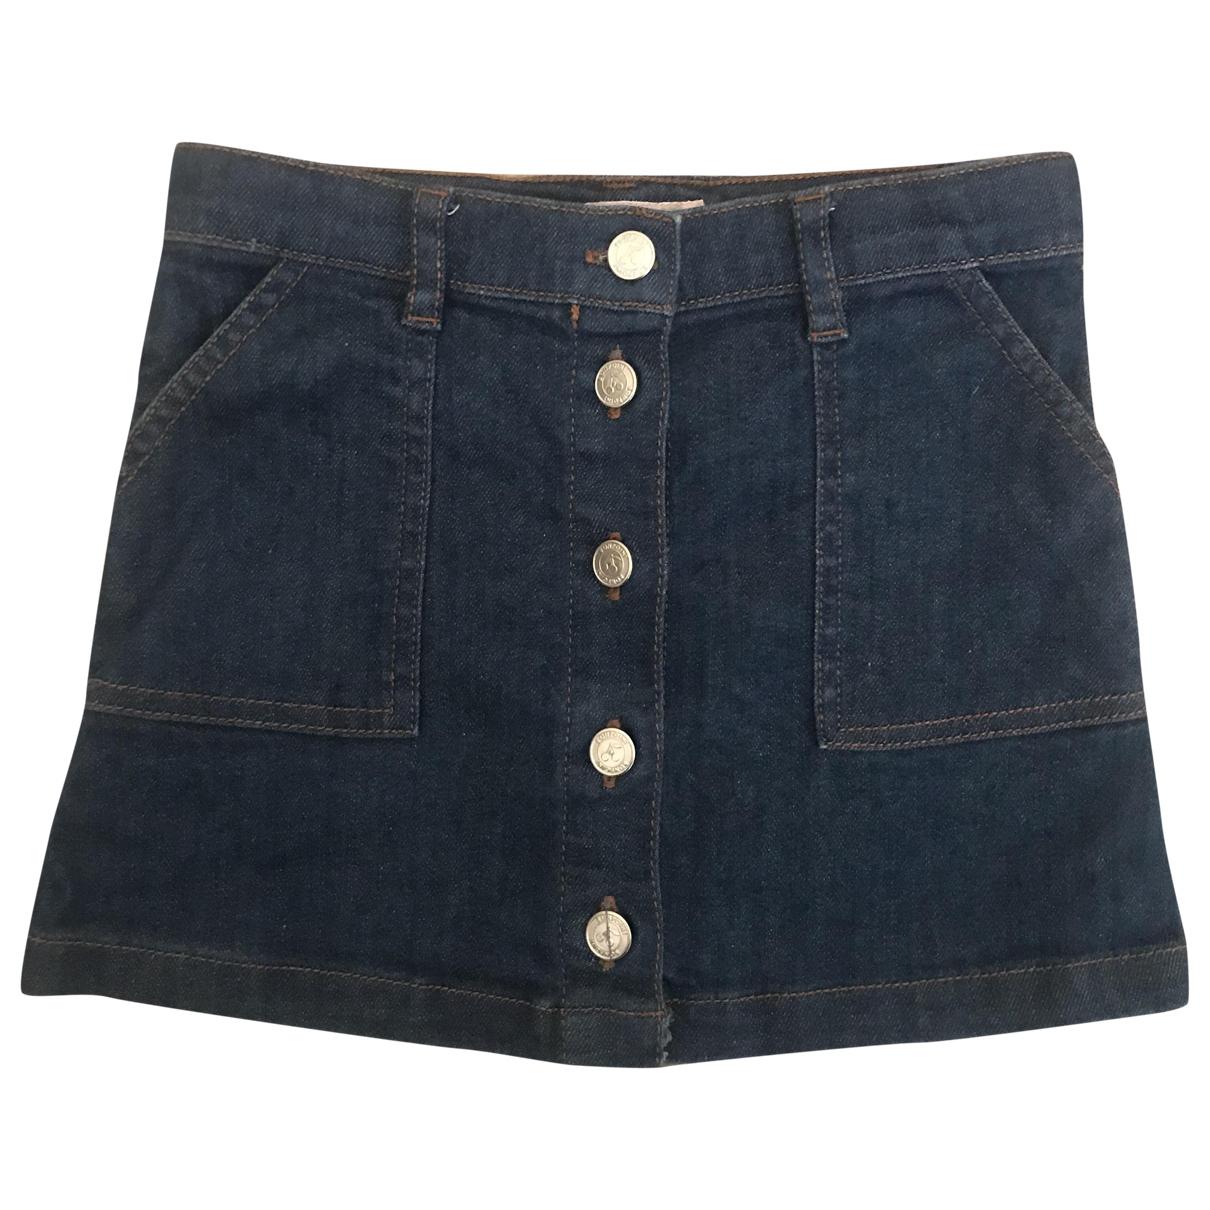 Bonpoint \N Blue Denim - Jeans skirt for Kids 4 years - up to 102cm FR